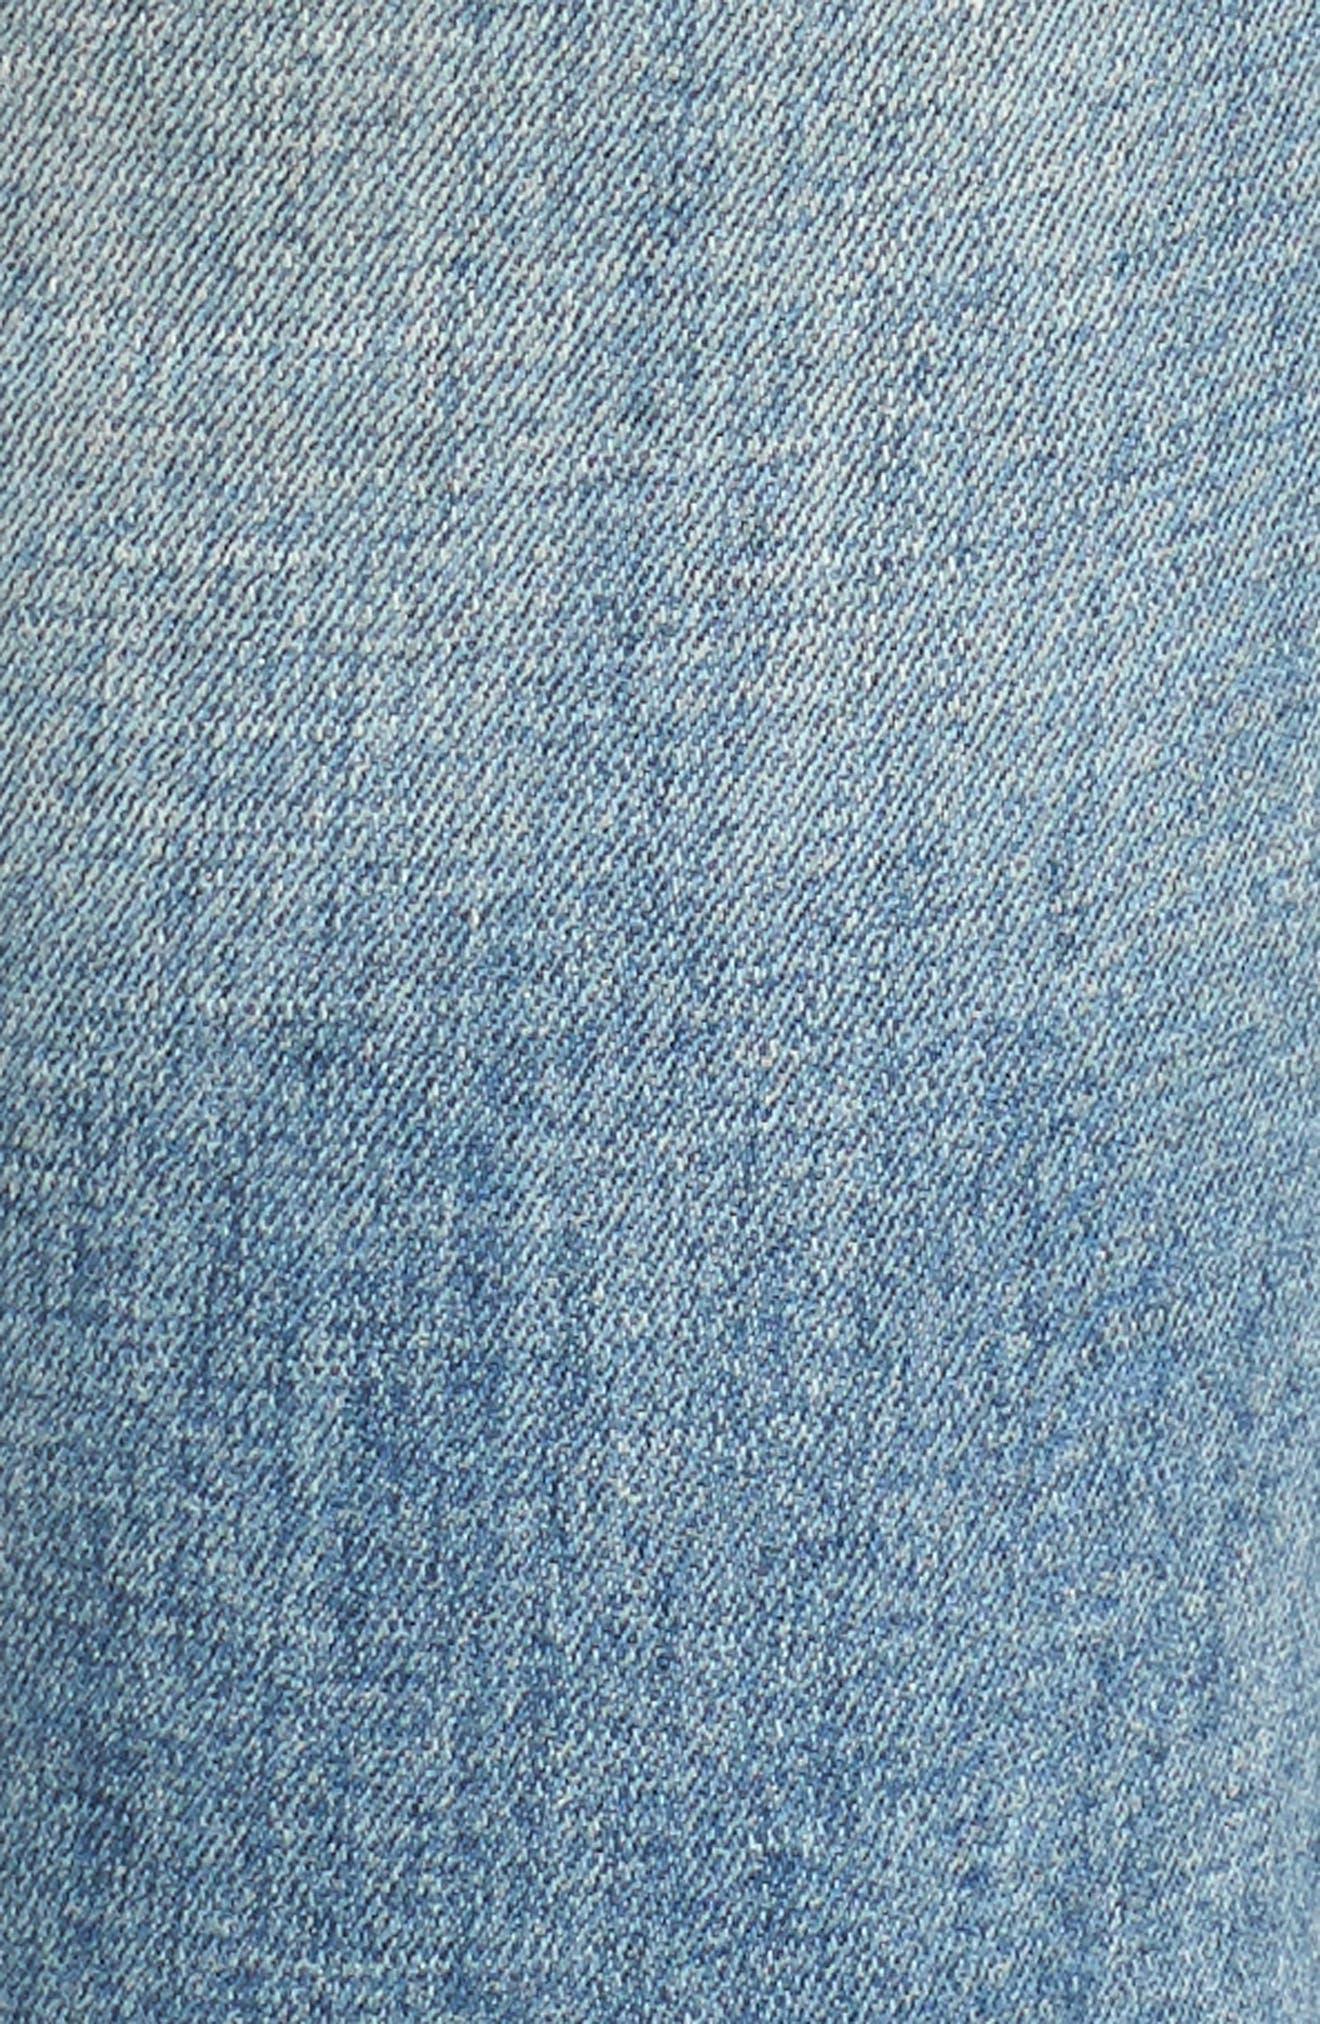 Alternate Image 5  - BLANKNYC Lost & Found Cuffed Straight Leg Jeans